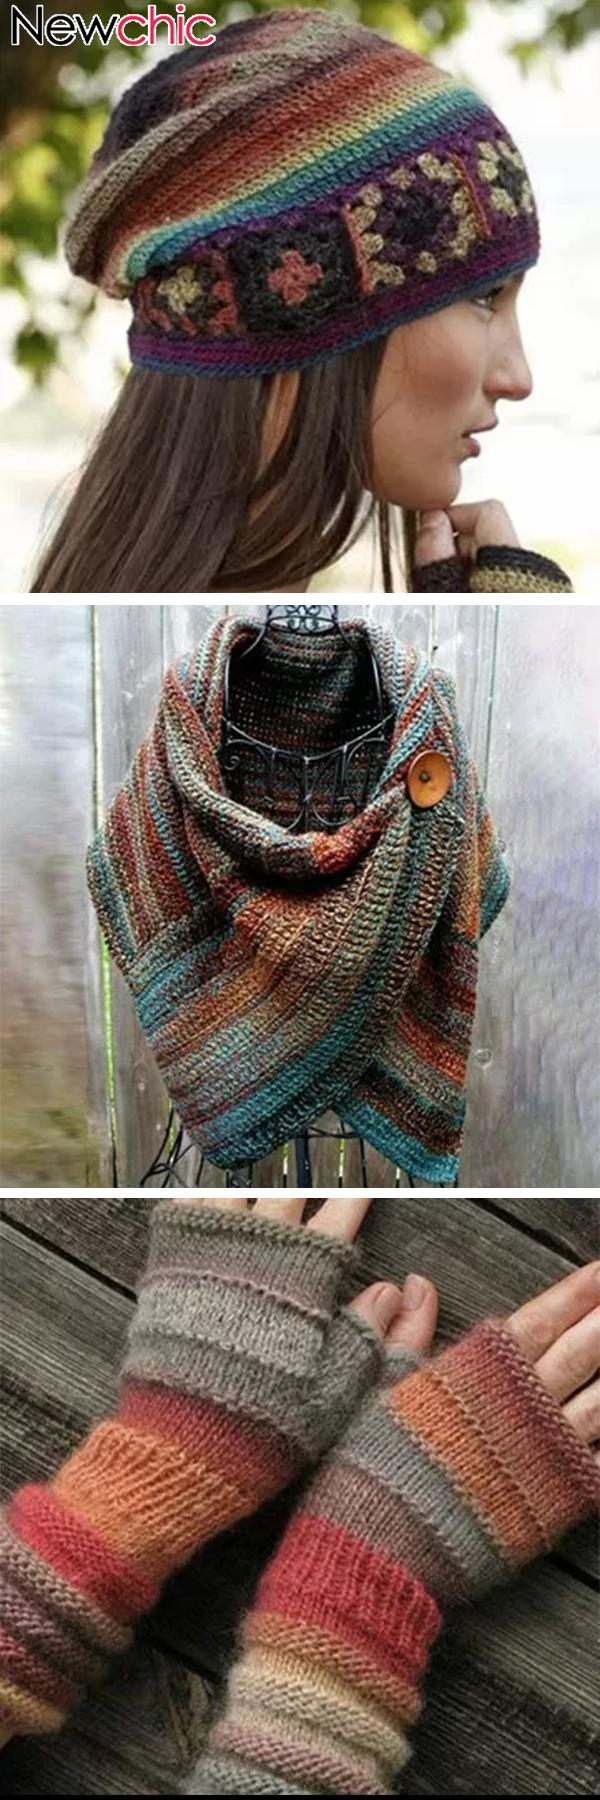 Shop Today|Women's Casual Multicolor Stripes Round Neck Scarves #breienenhaken S…